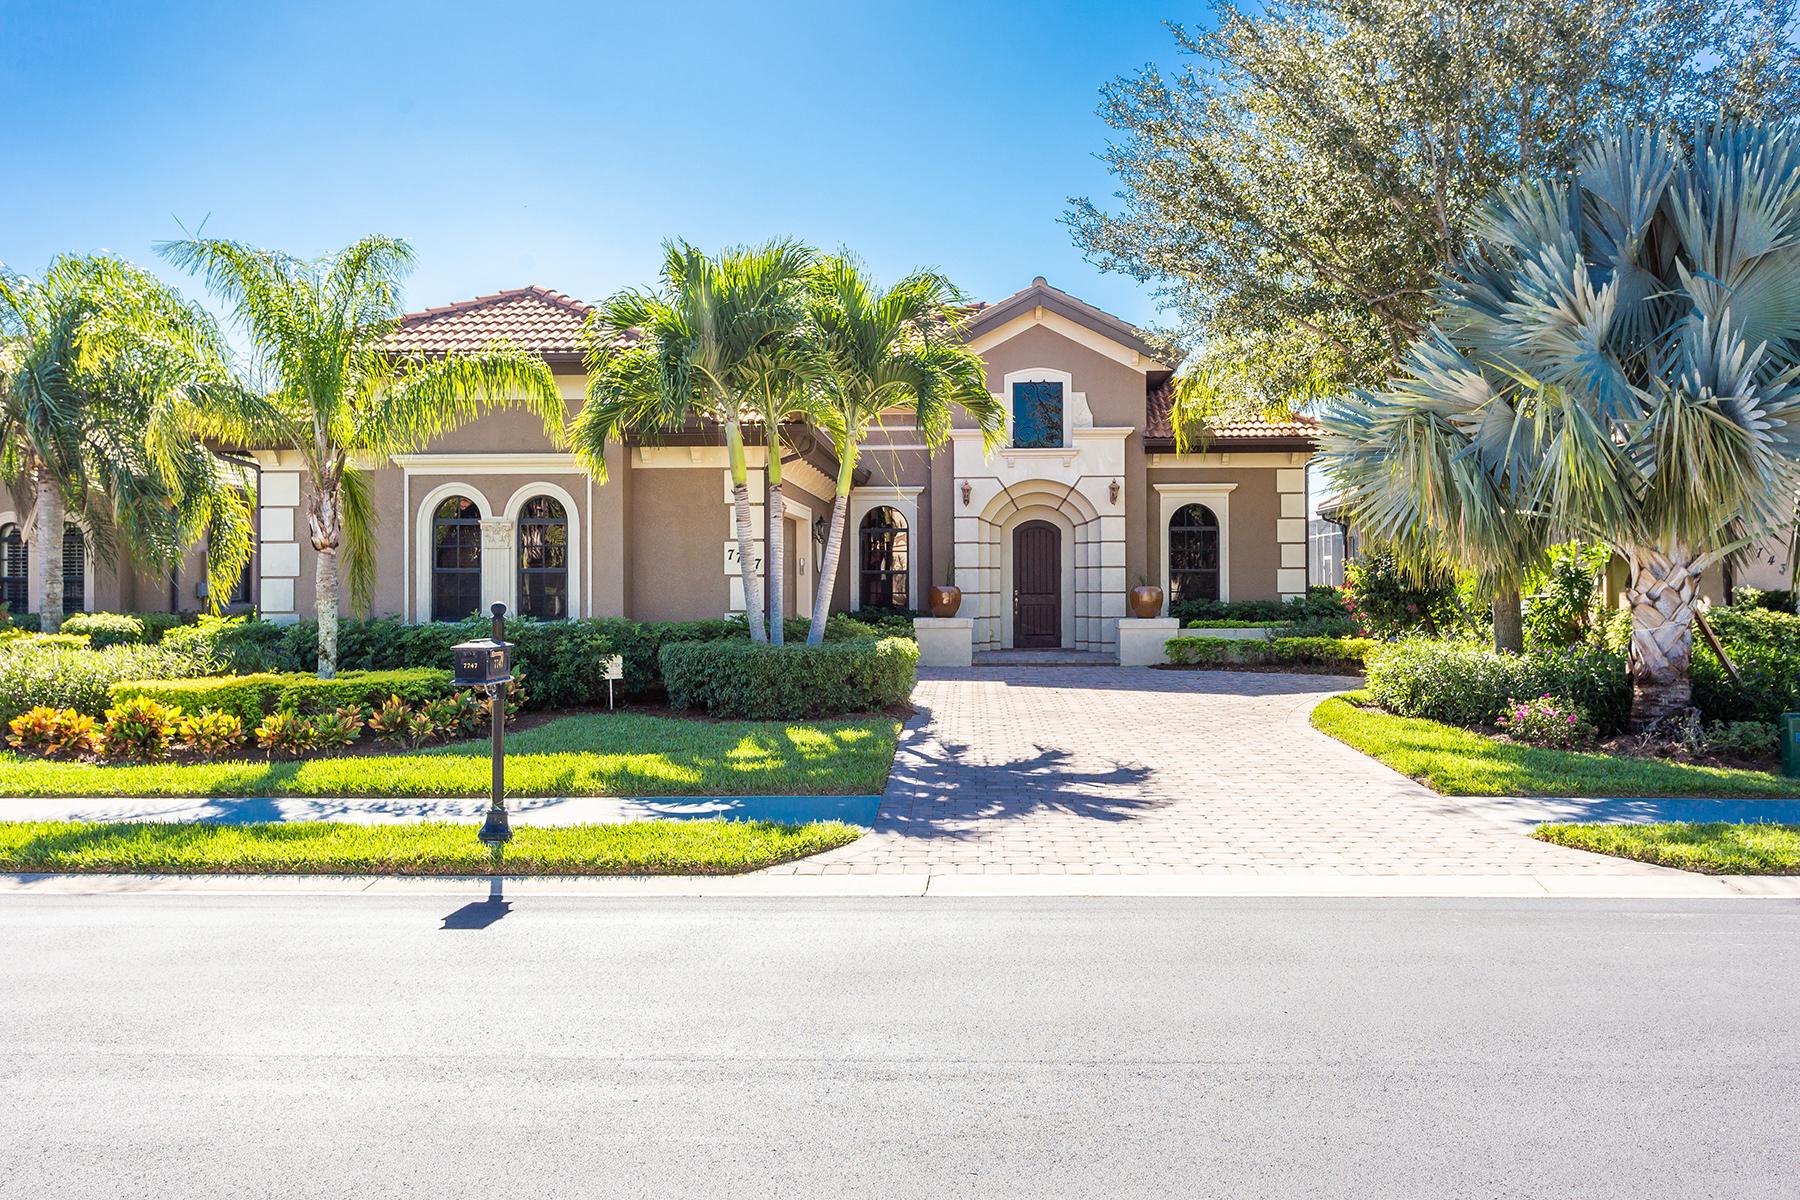 LELY RESORT - COTTESMORE 7747  Cottesmore Dr, Naples, Florida 34113 États-Unis